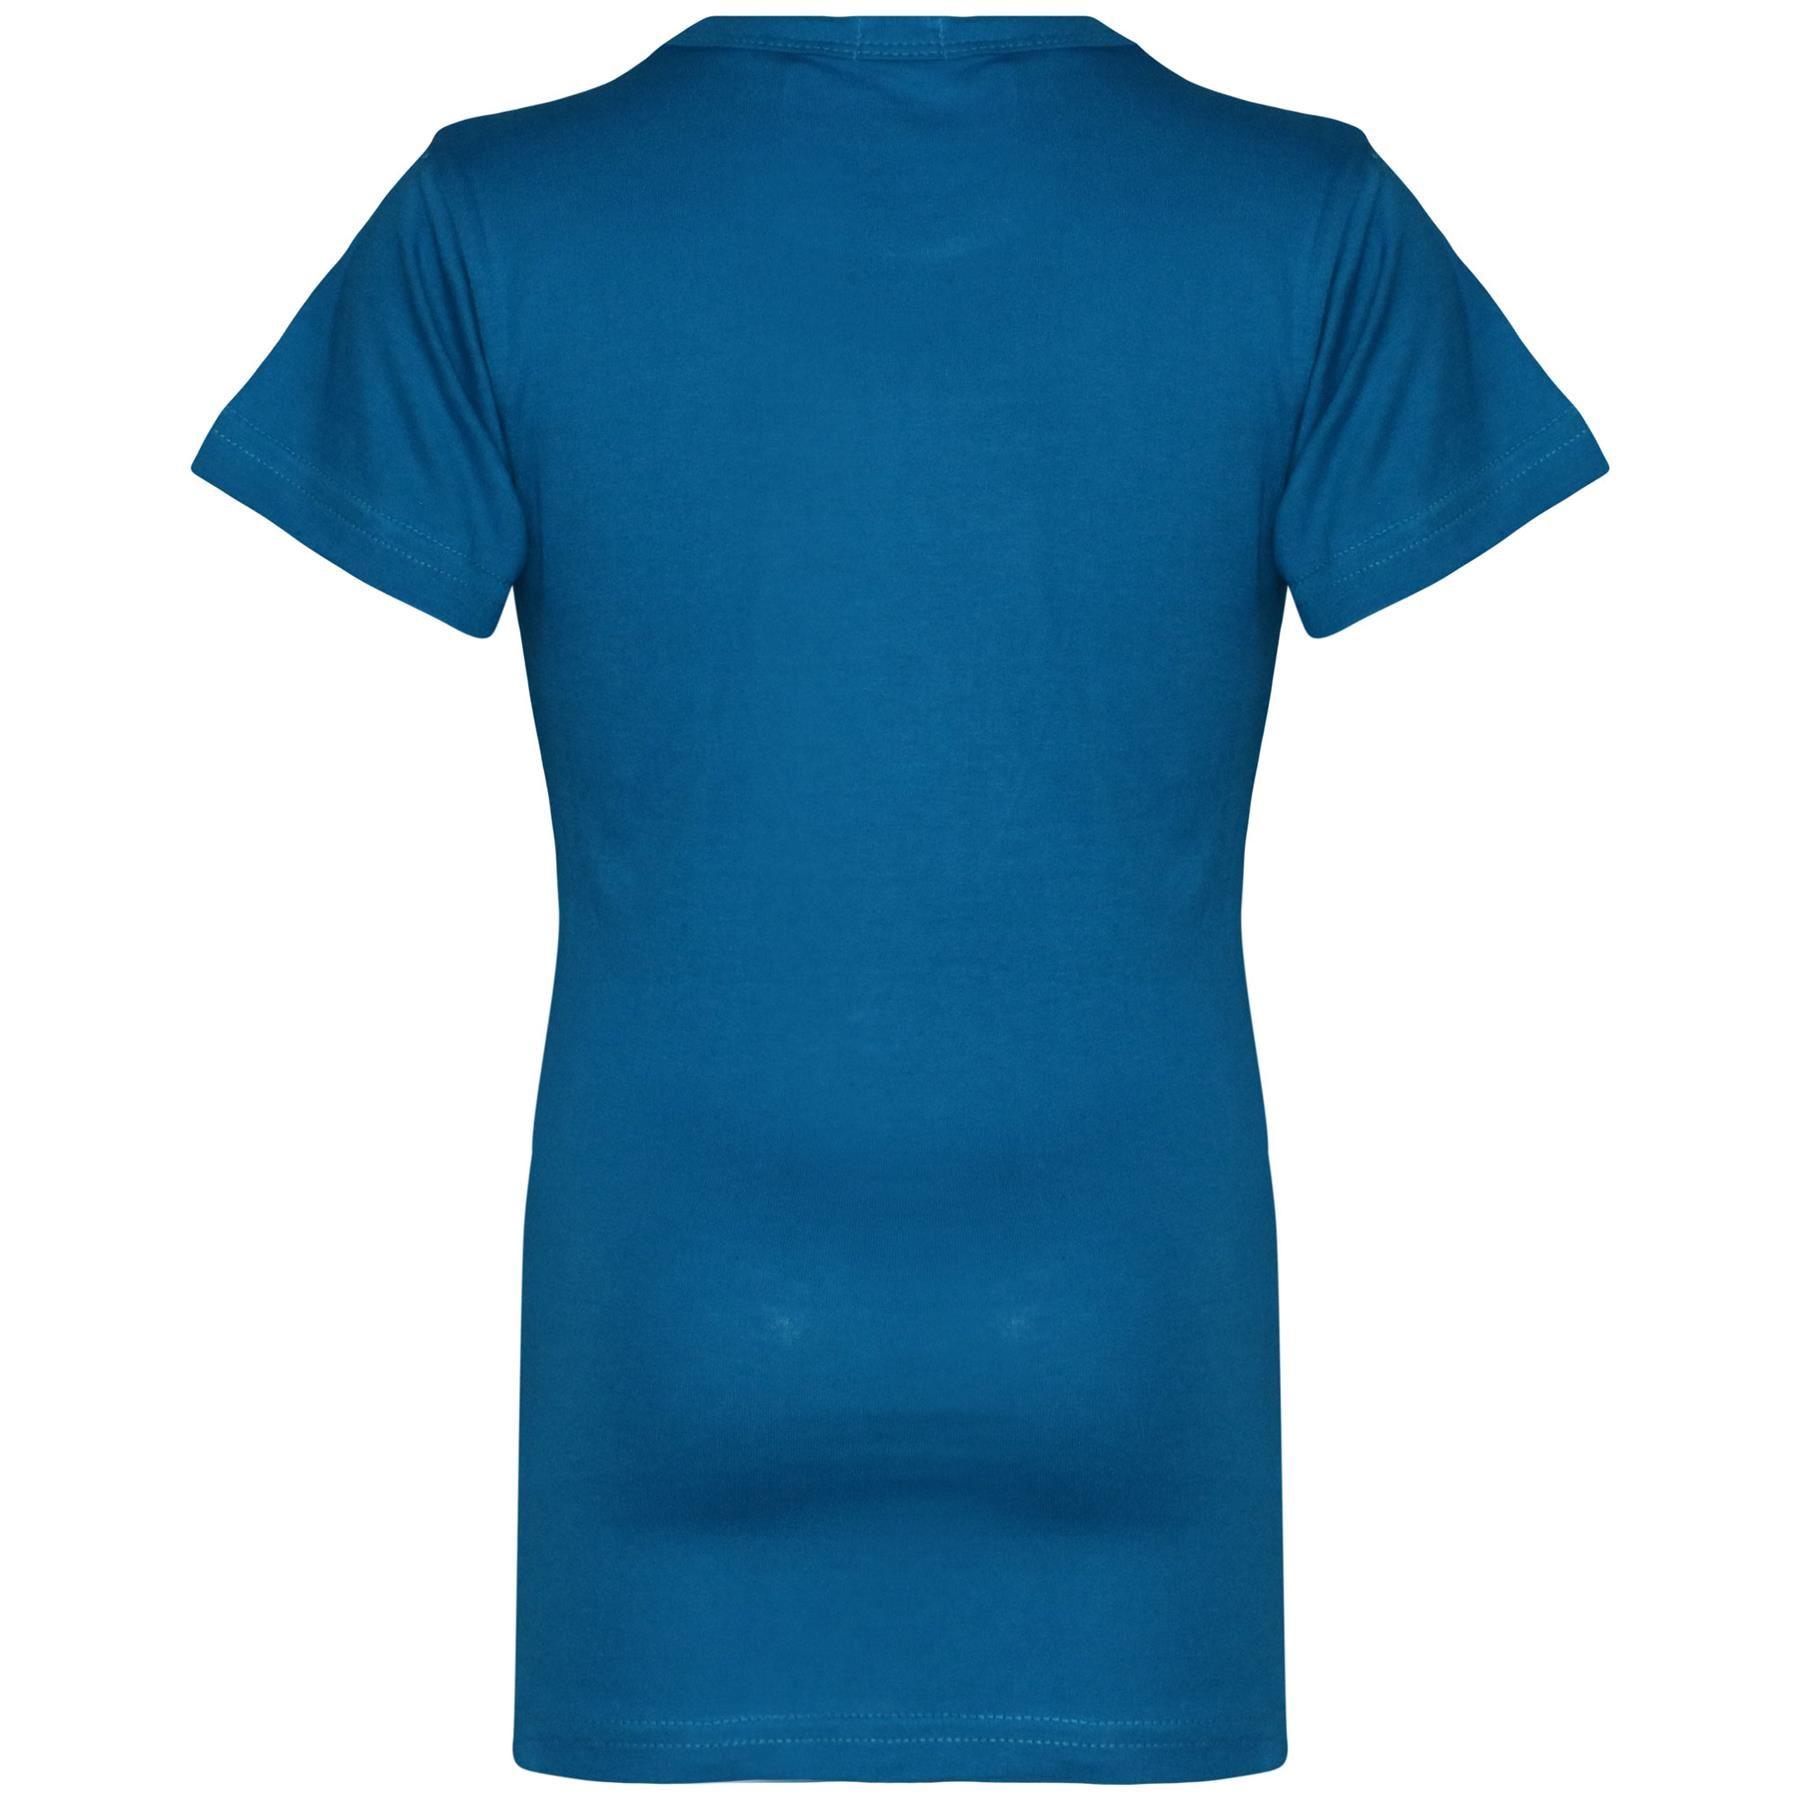 Kids-Girls-T-Shirts-Designer-100-Cotton-Plain-School-T-Shirt-Top-New-Age-3-13Yr thumbnail 12